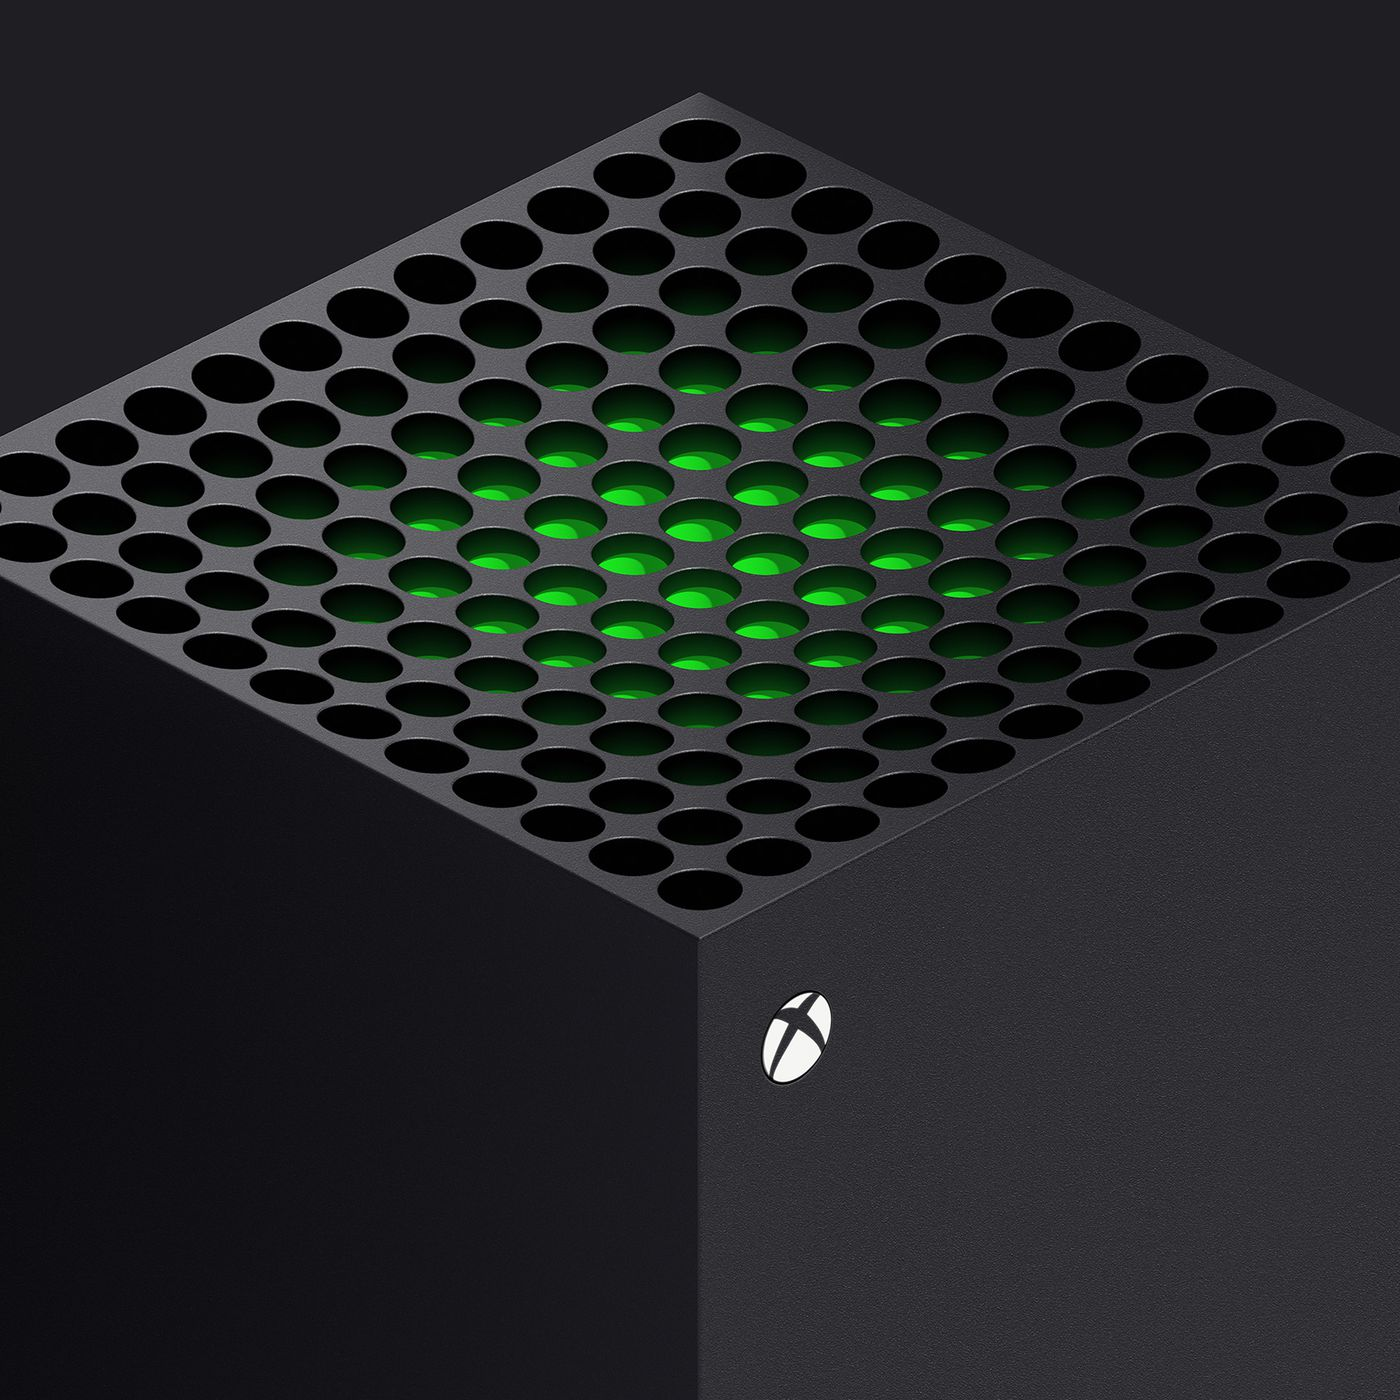 Xbox Series X Games Showcase Date Announced July 23 Polygon